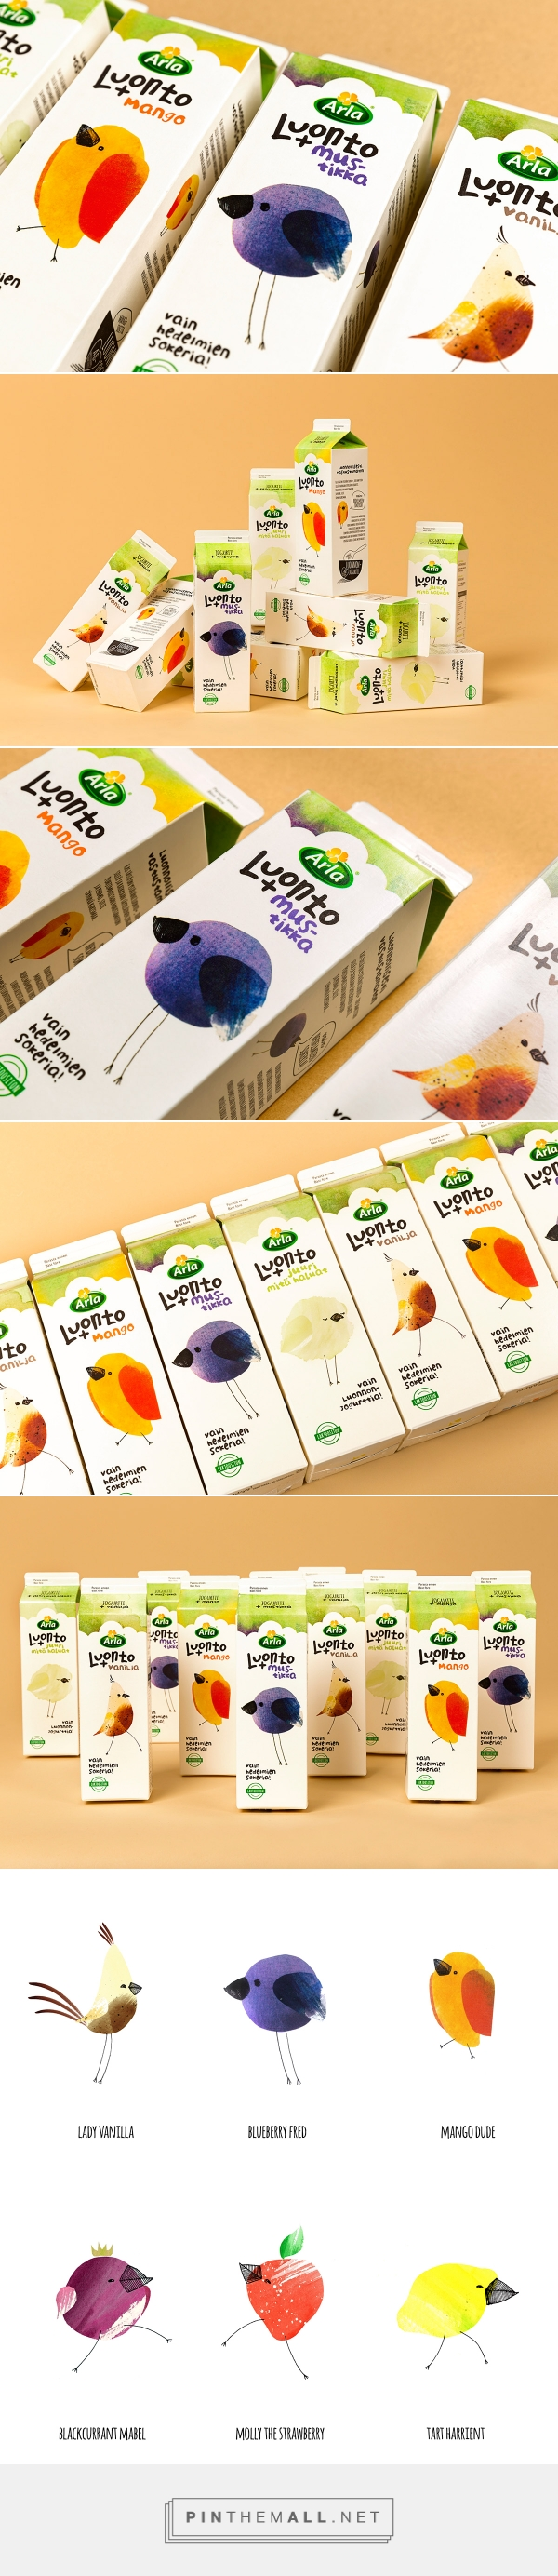 Arla Luonto+ Yoghurt Packaging labels design, Organic